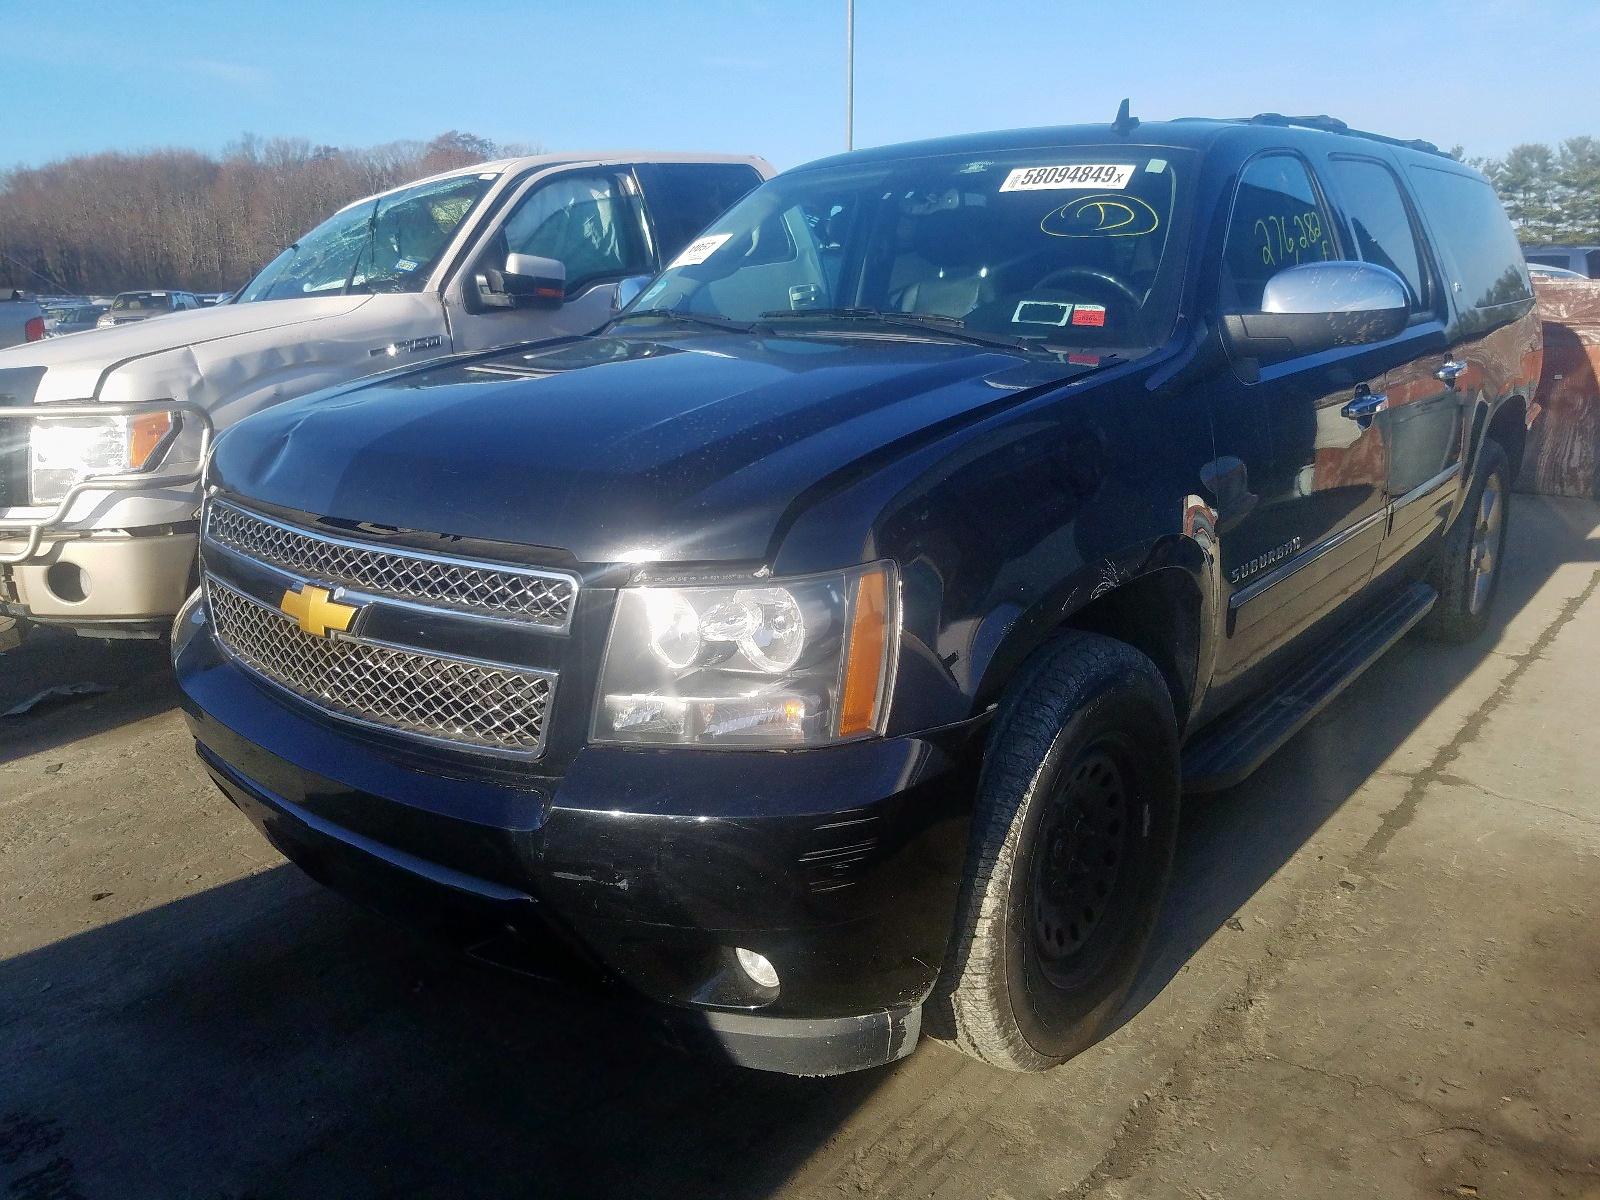 2012 Chevrolet Suburban K 5.3L Right View